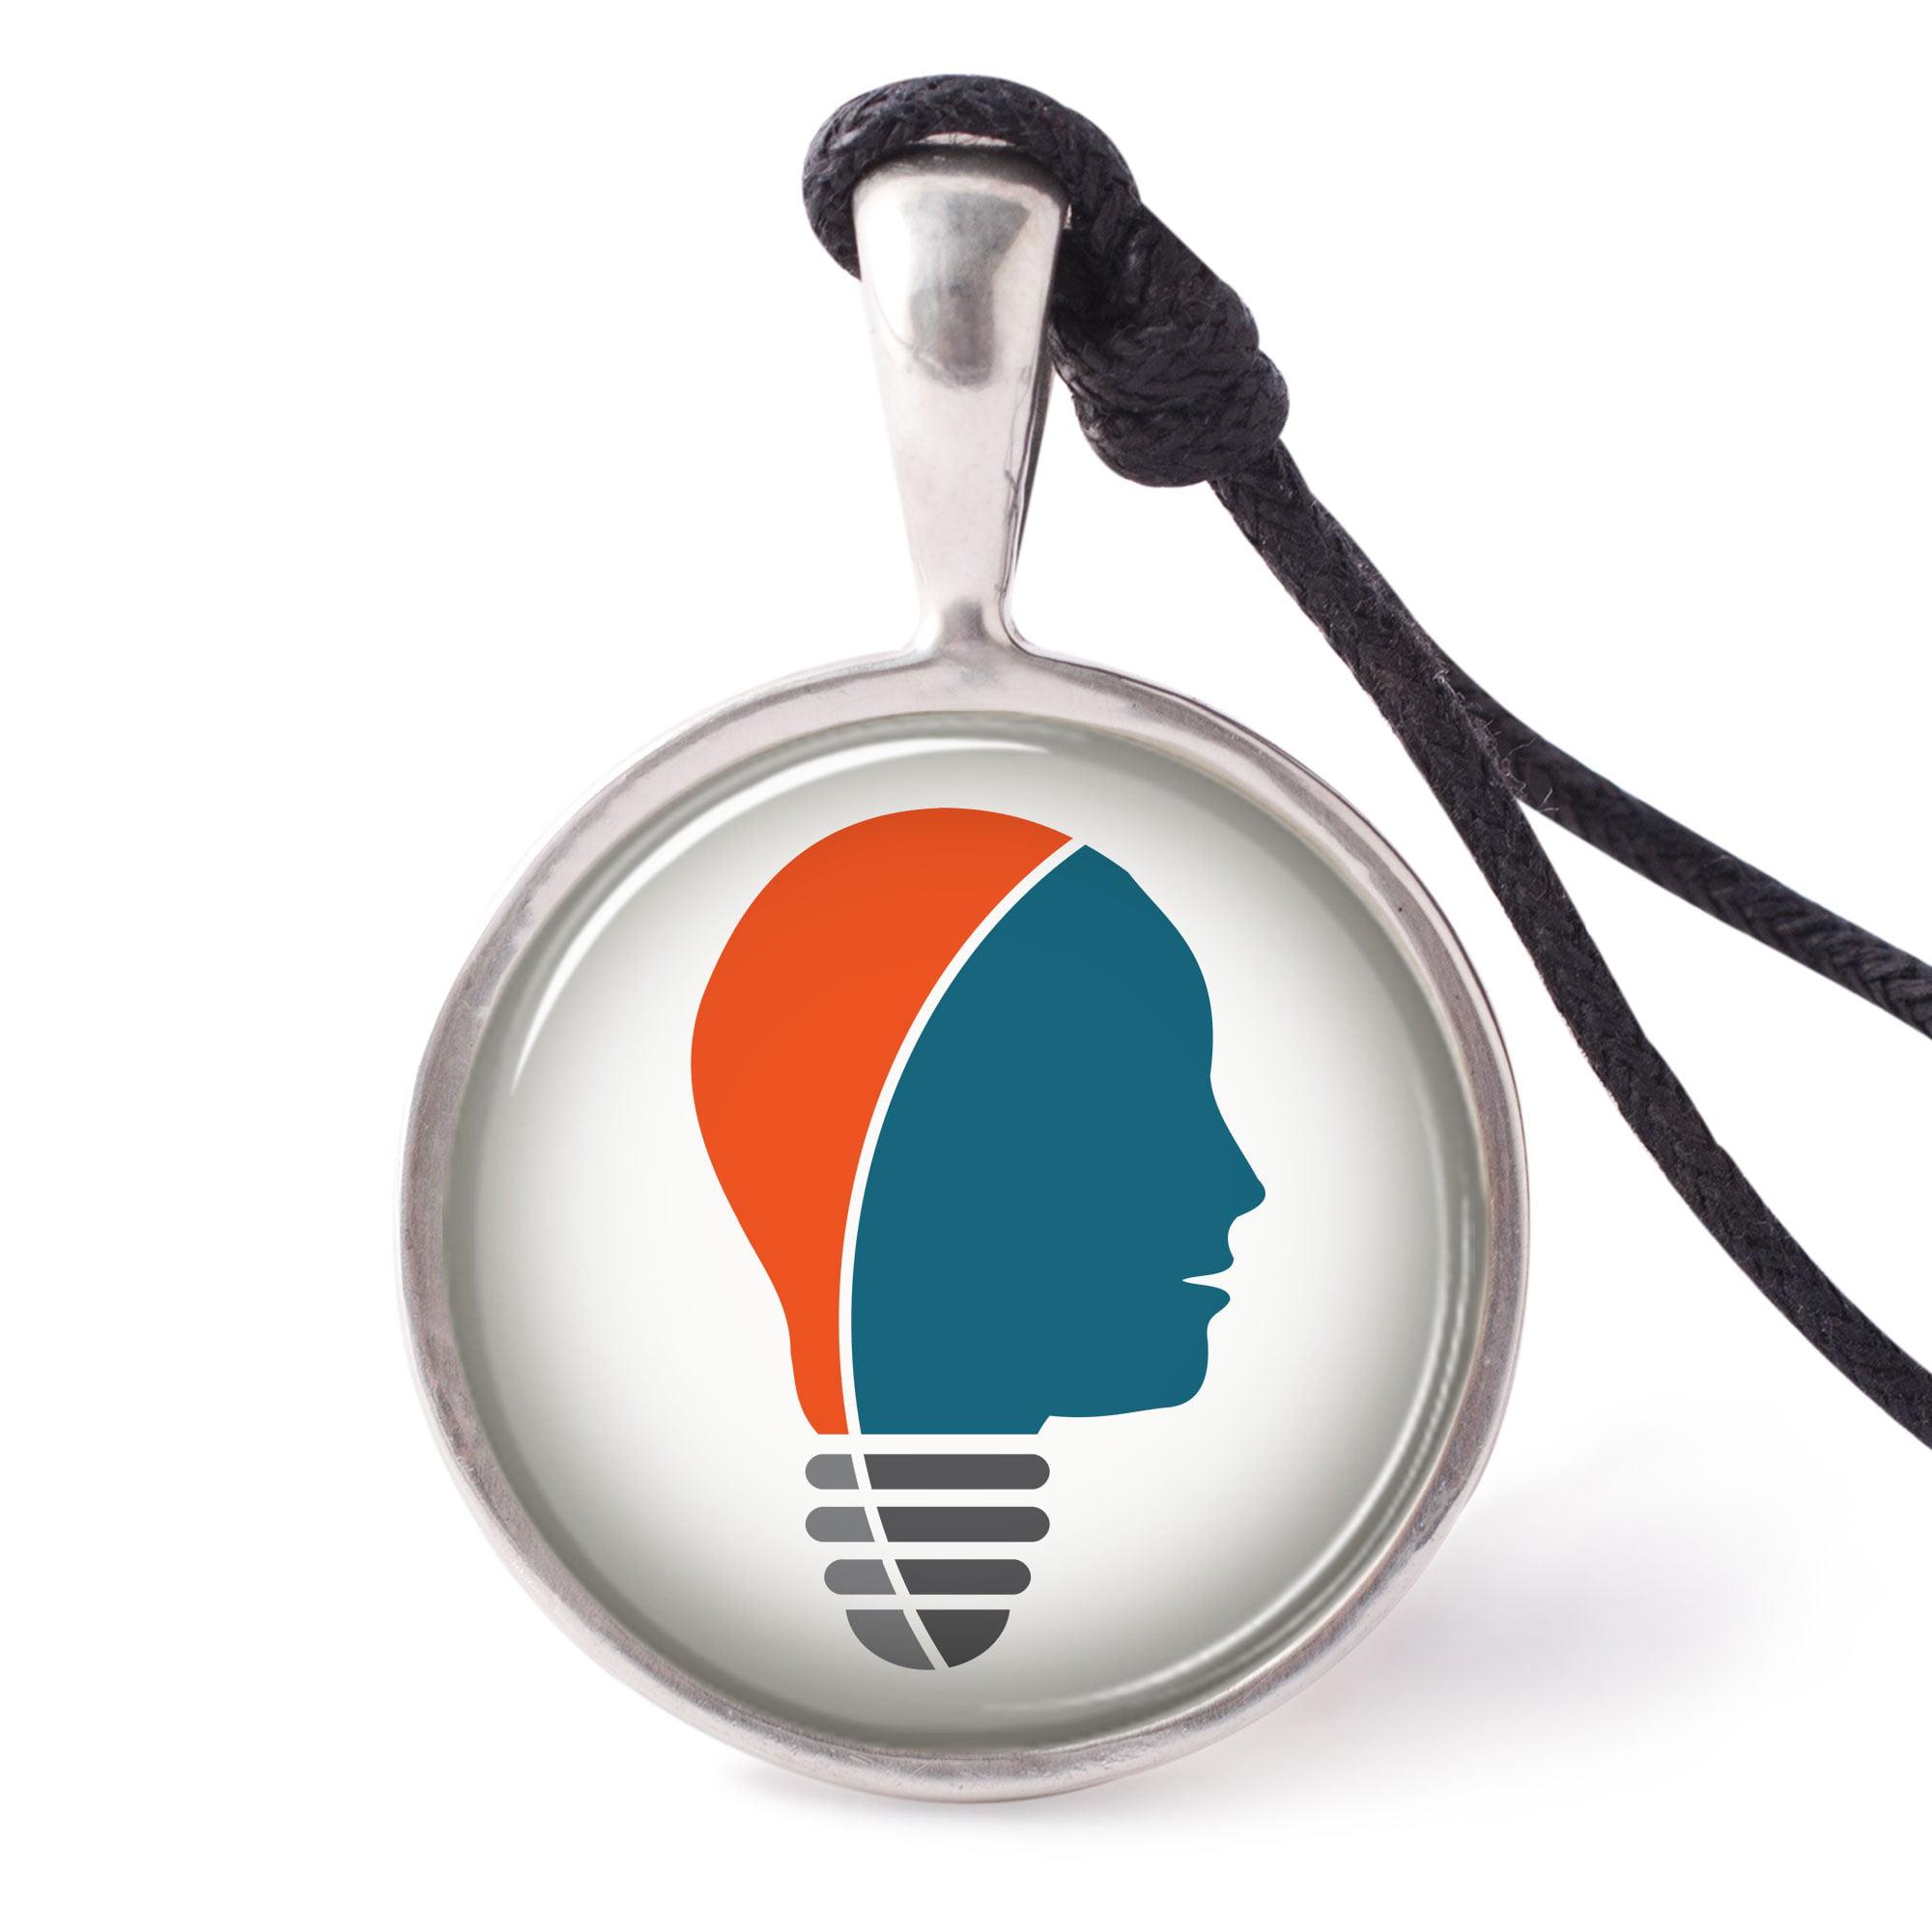 Vietguild's Business Bulb Icon Necklace Pendants Pewter Silver